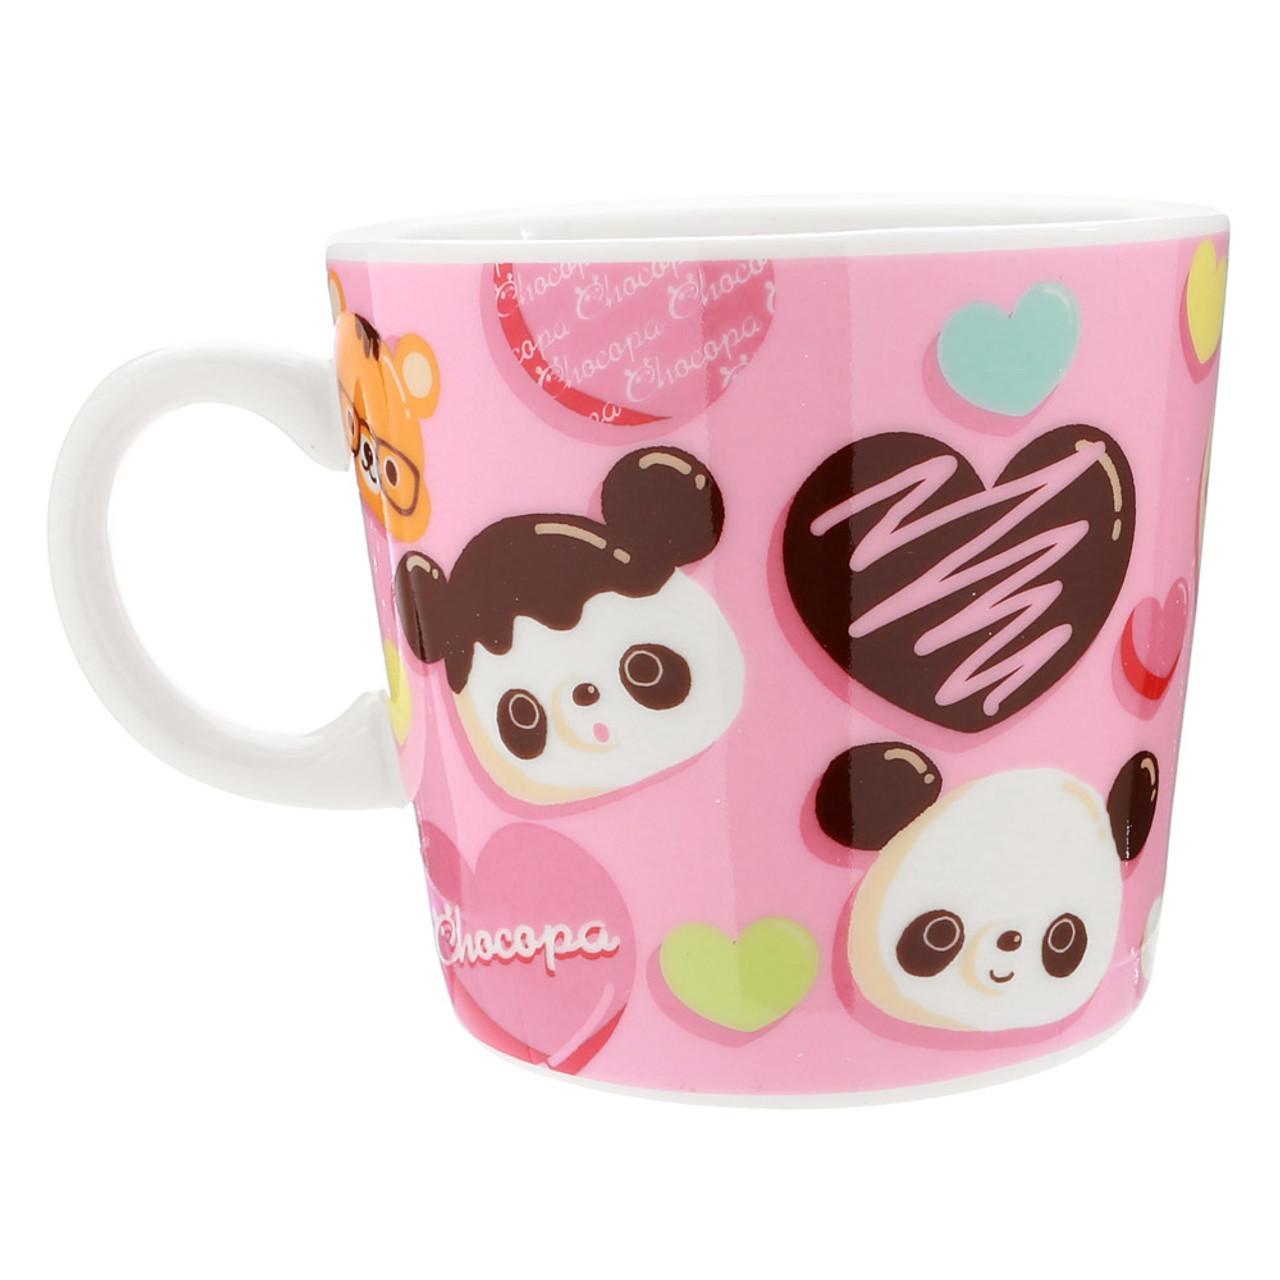 San-x Chocopa Panda Pink Porcelain Cup ( Back View )